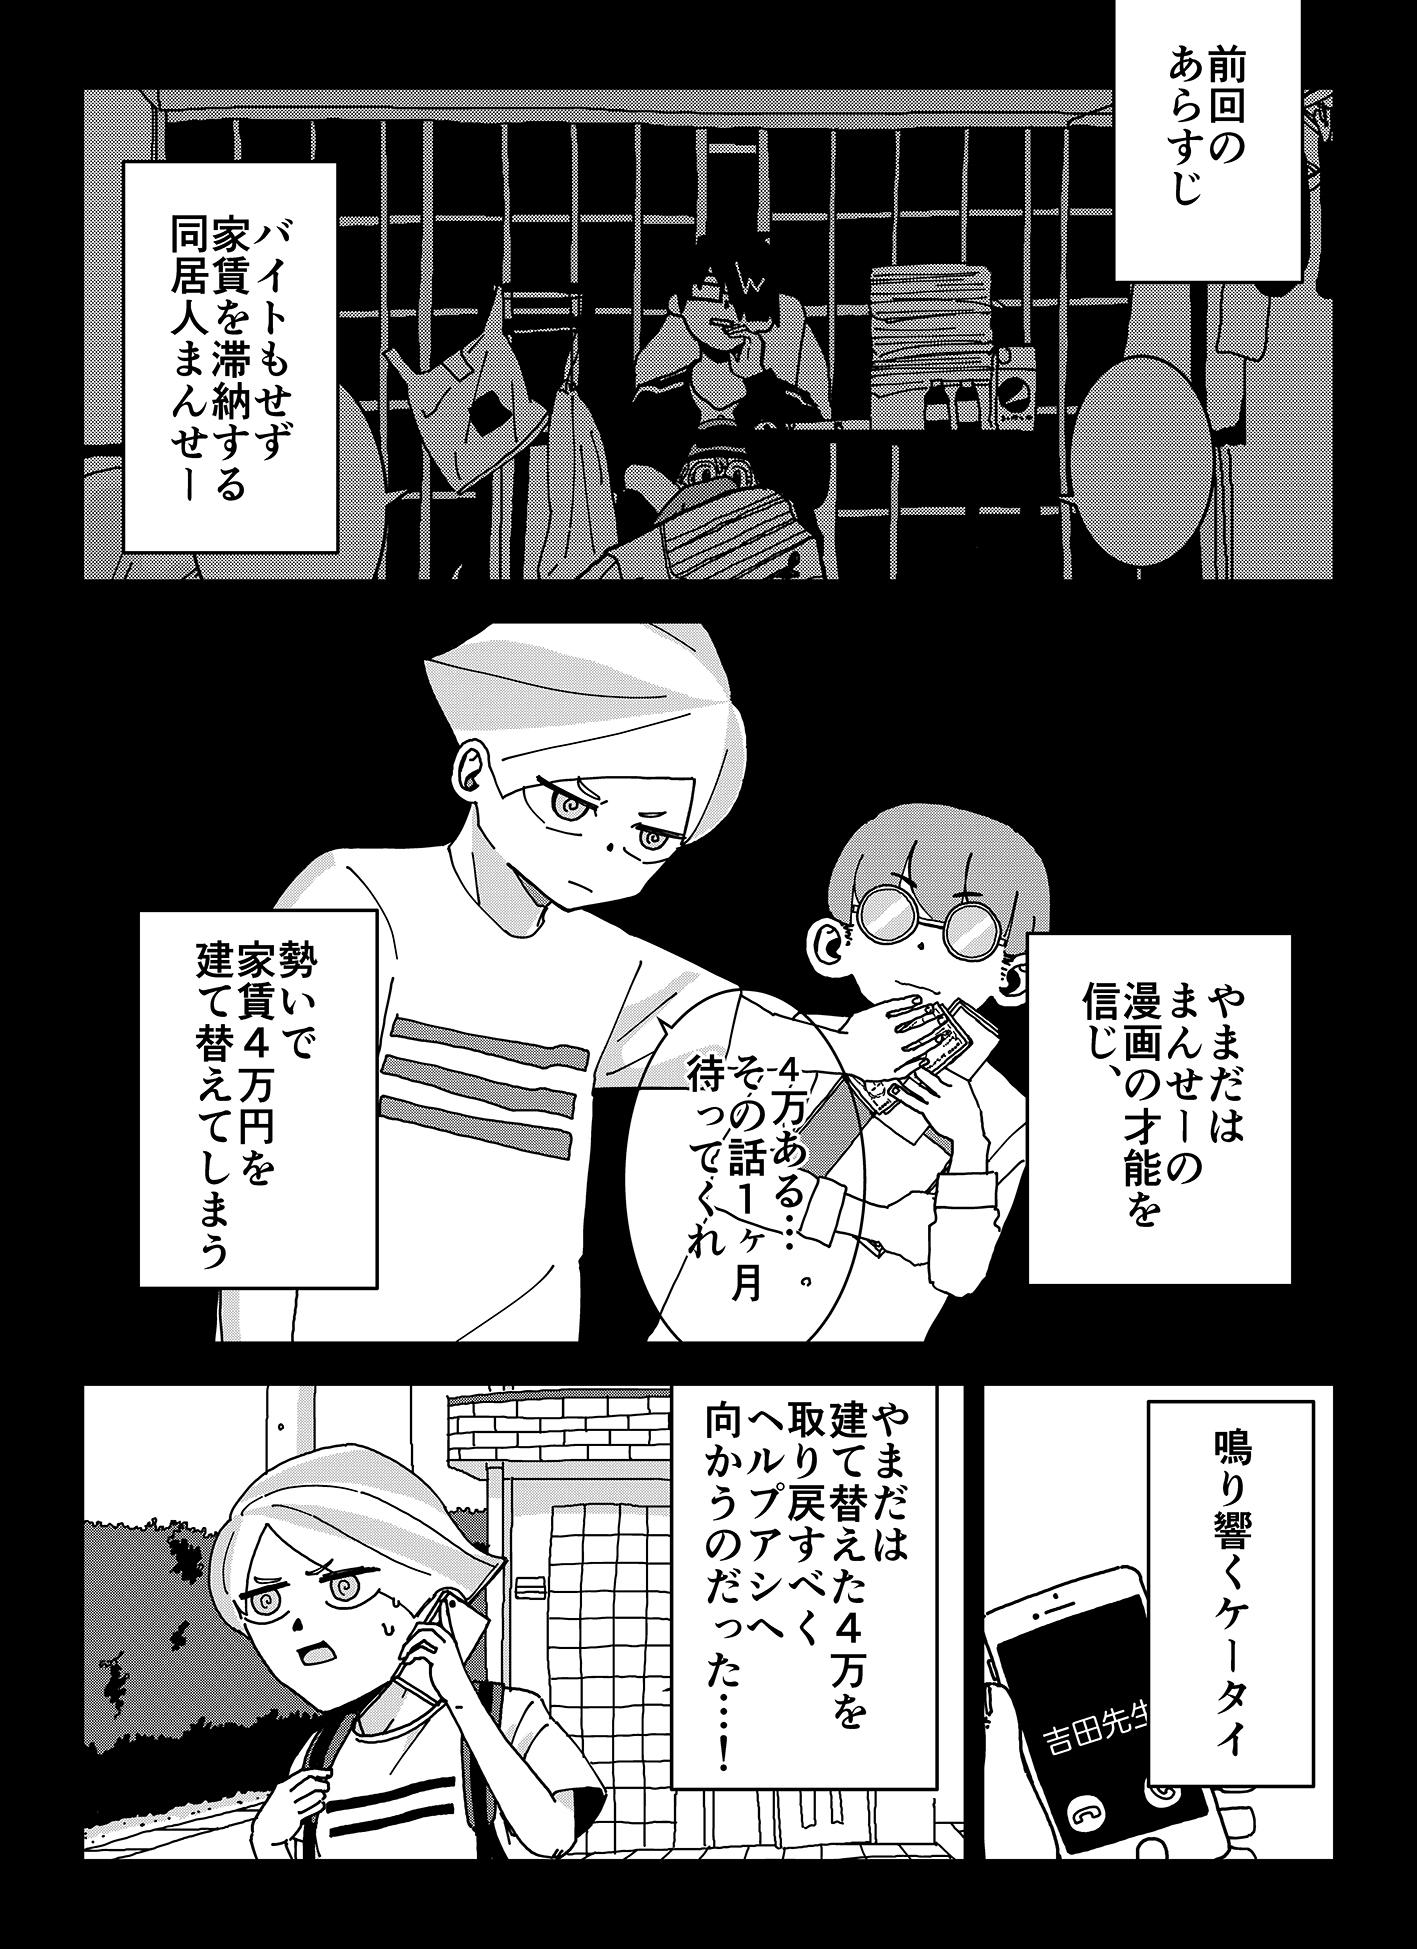 share_07_02_new